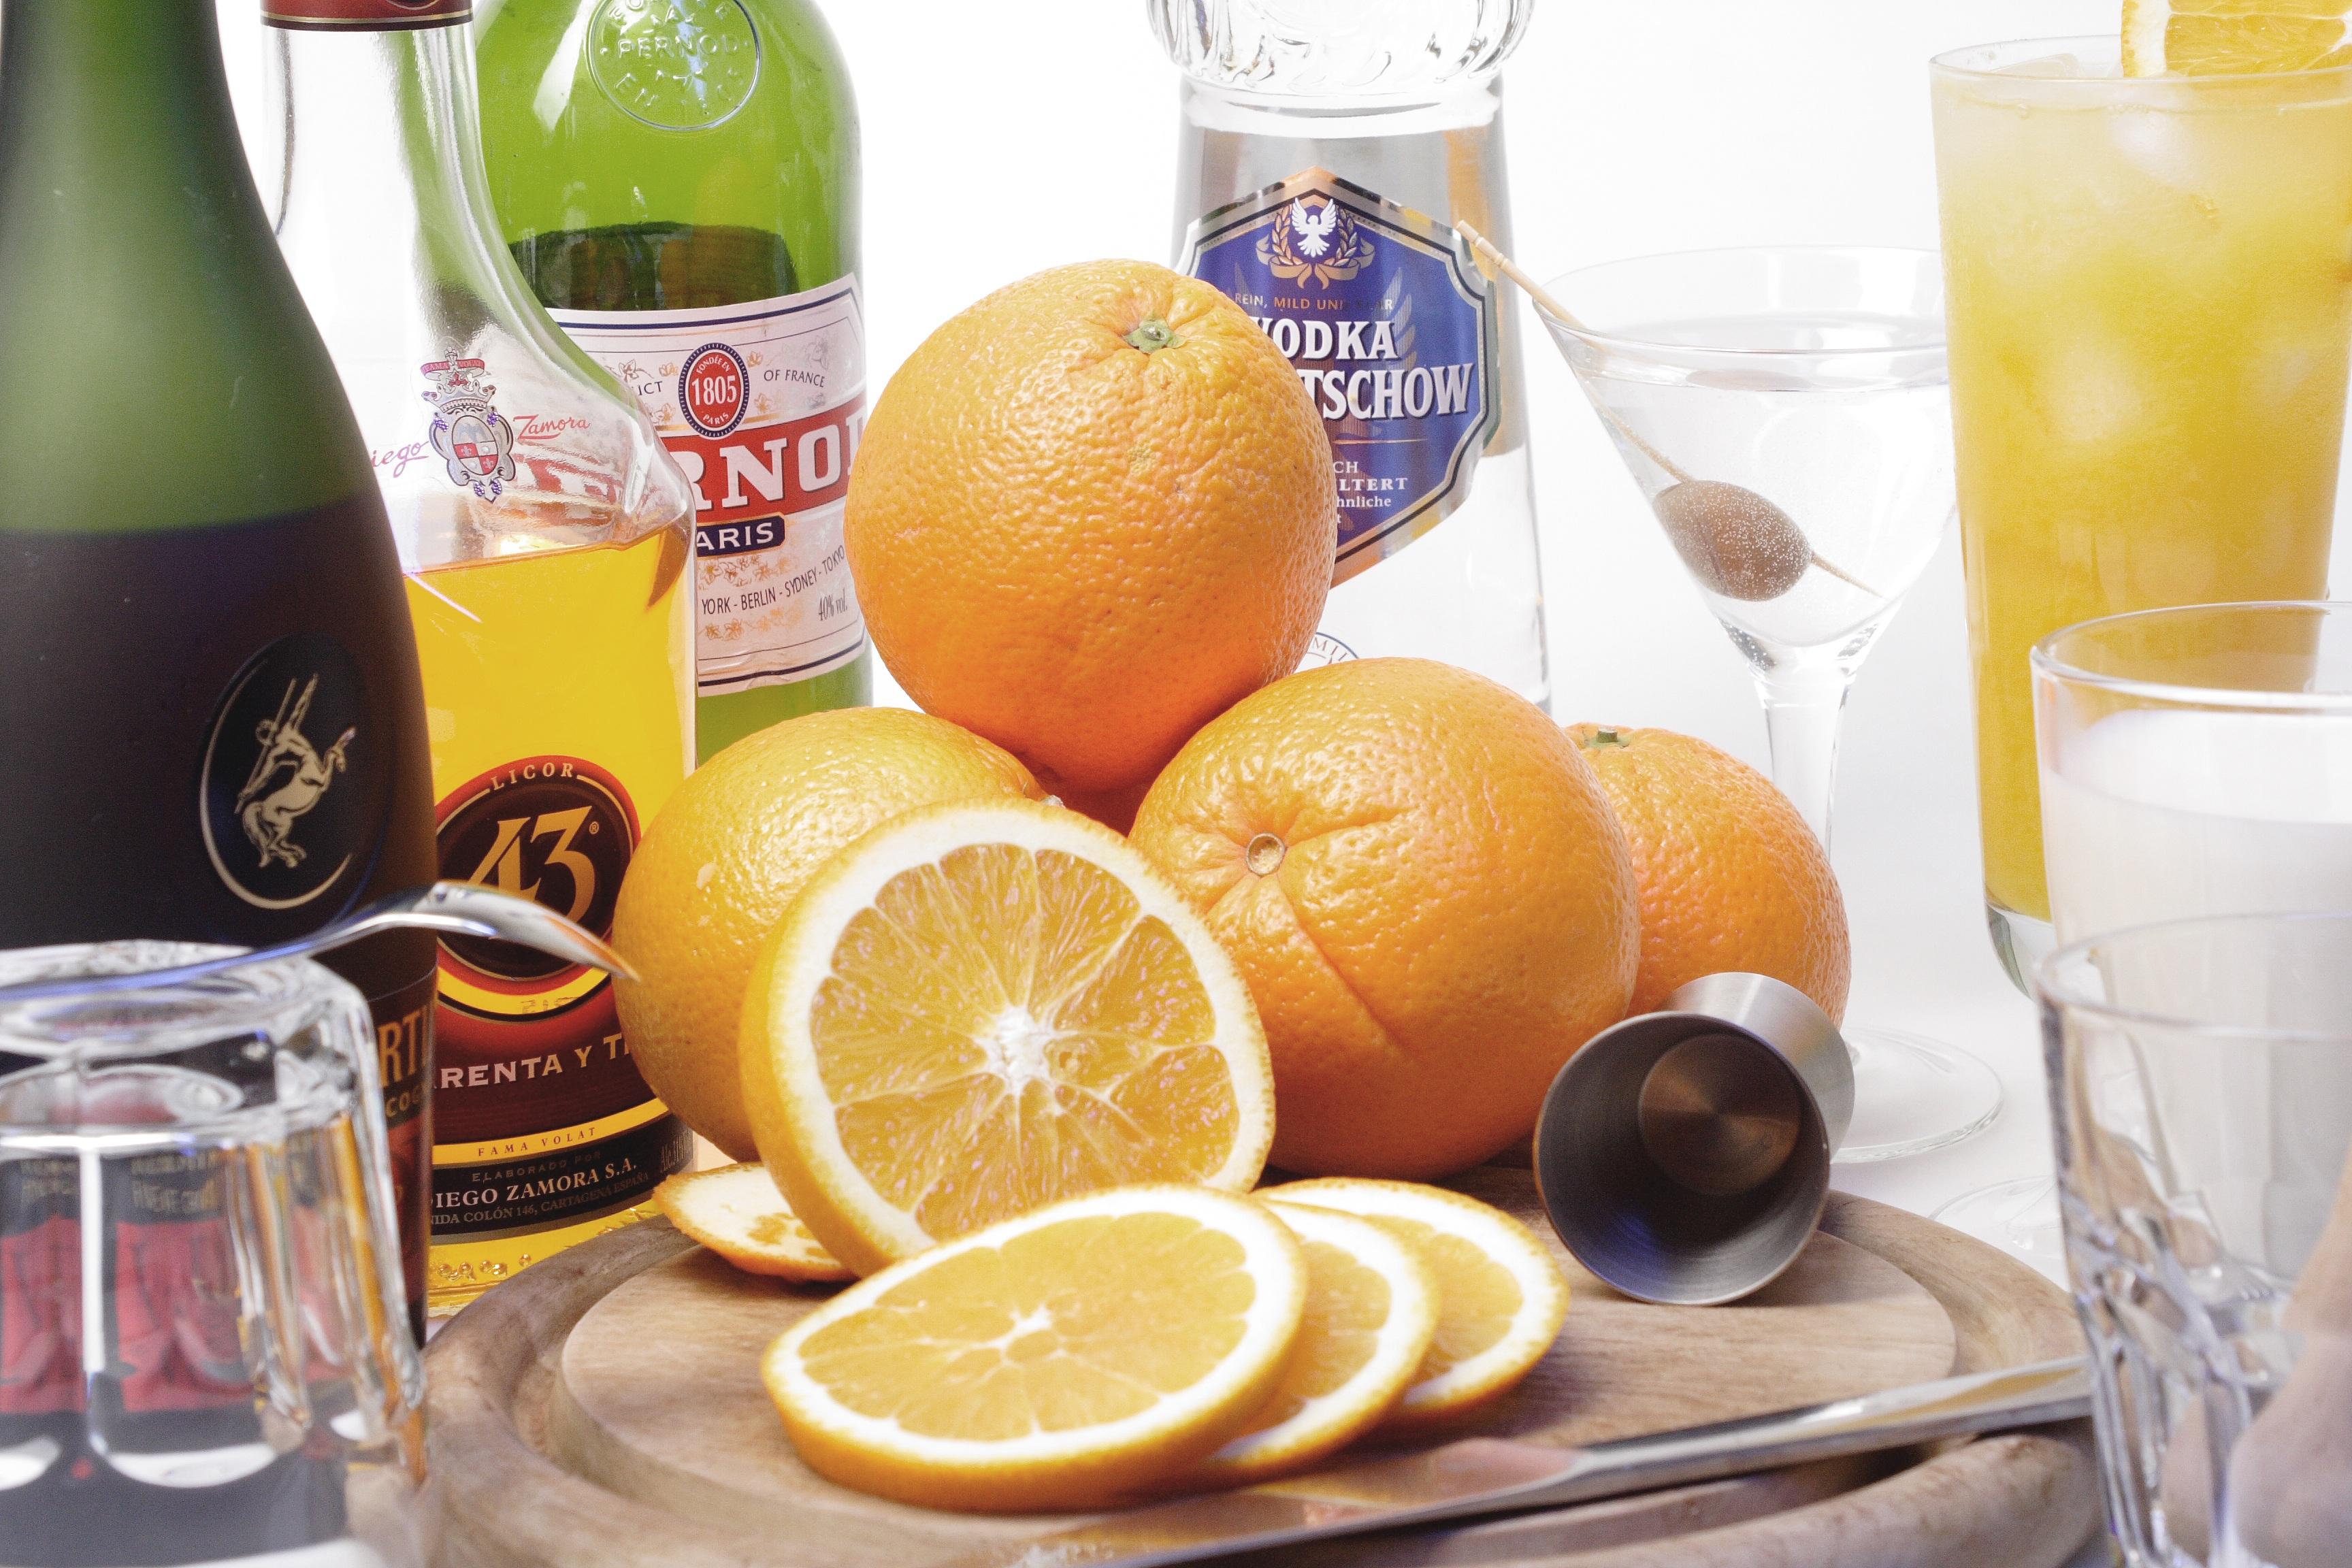 Free images plant fruit bar orange food produce lemonade plant fruit bar orange food produce lemonade drink recipe alcohol cocktail juice citrus forumfinder Choice Image